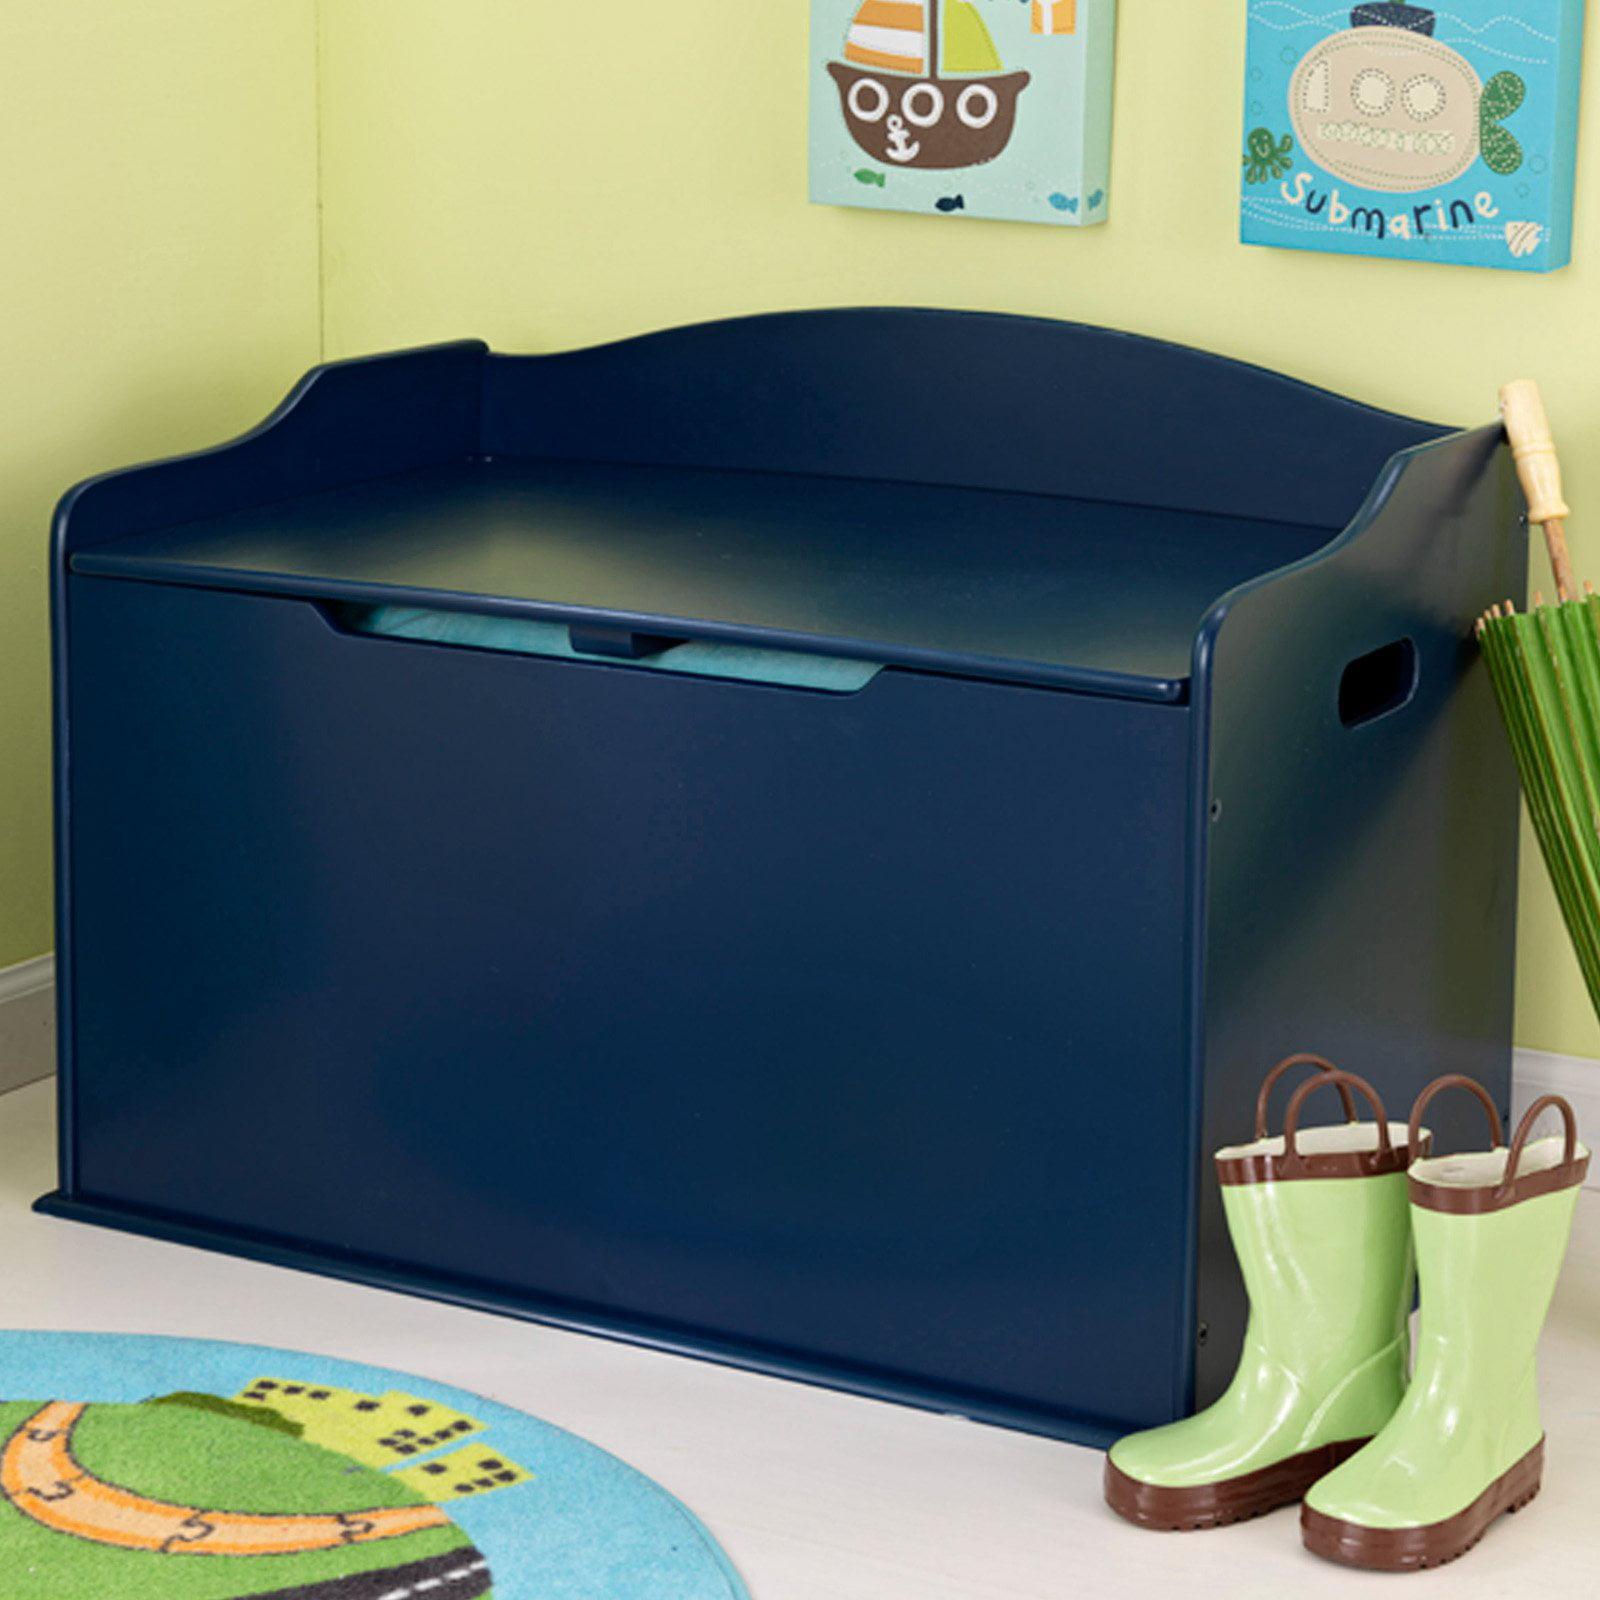 Kidkraft austin toy box natural 14953 - Kidkraft Austin Toy Box Natural 14953 37